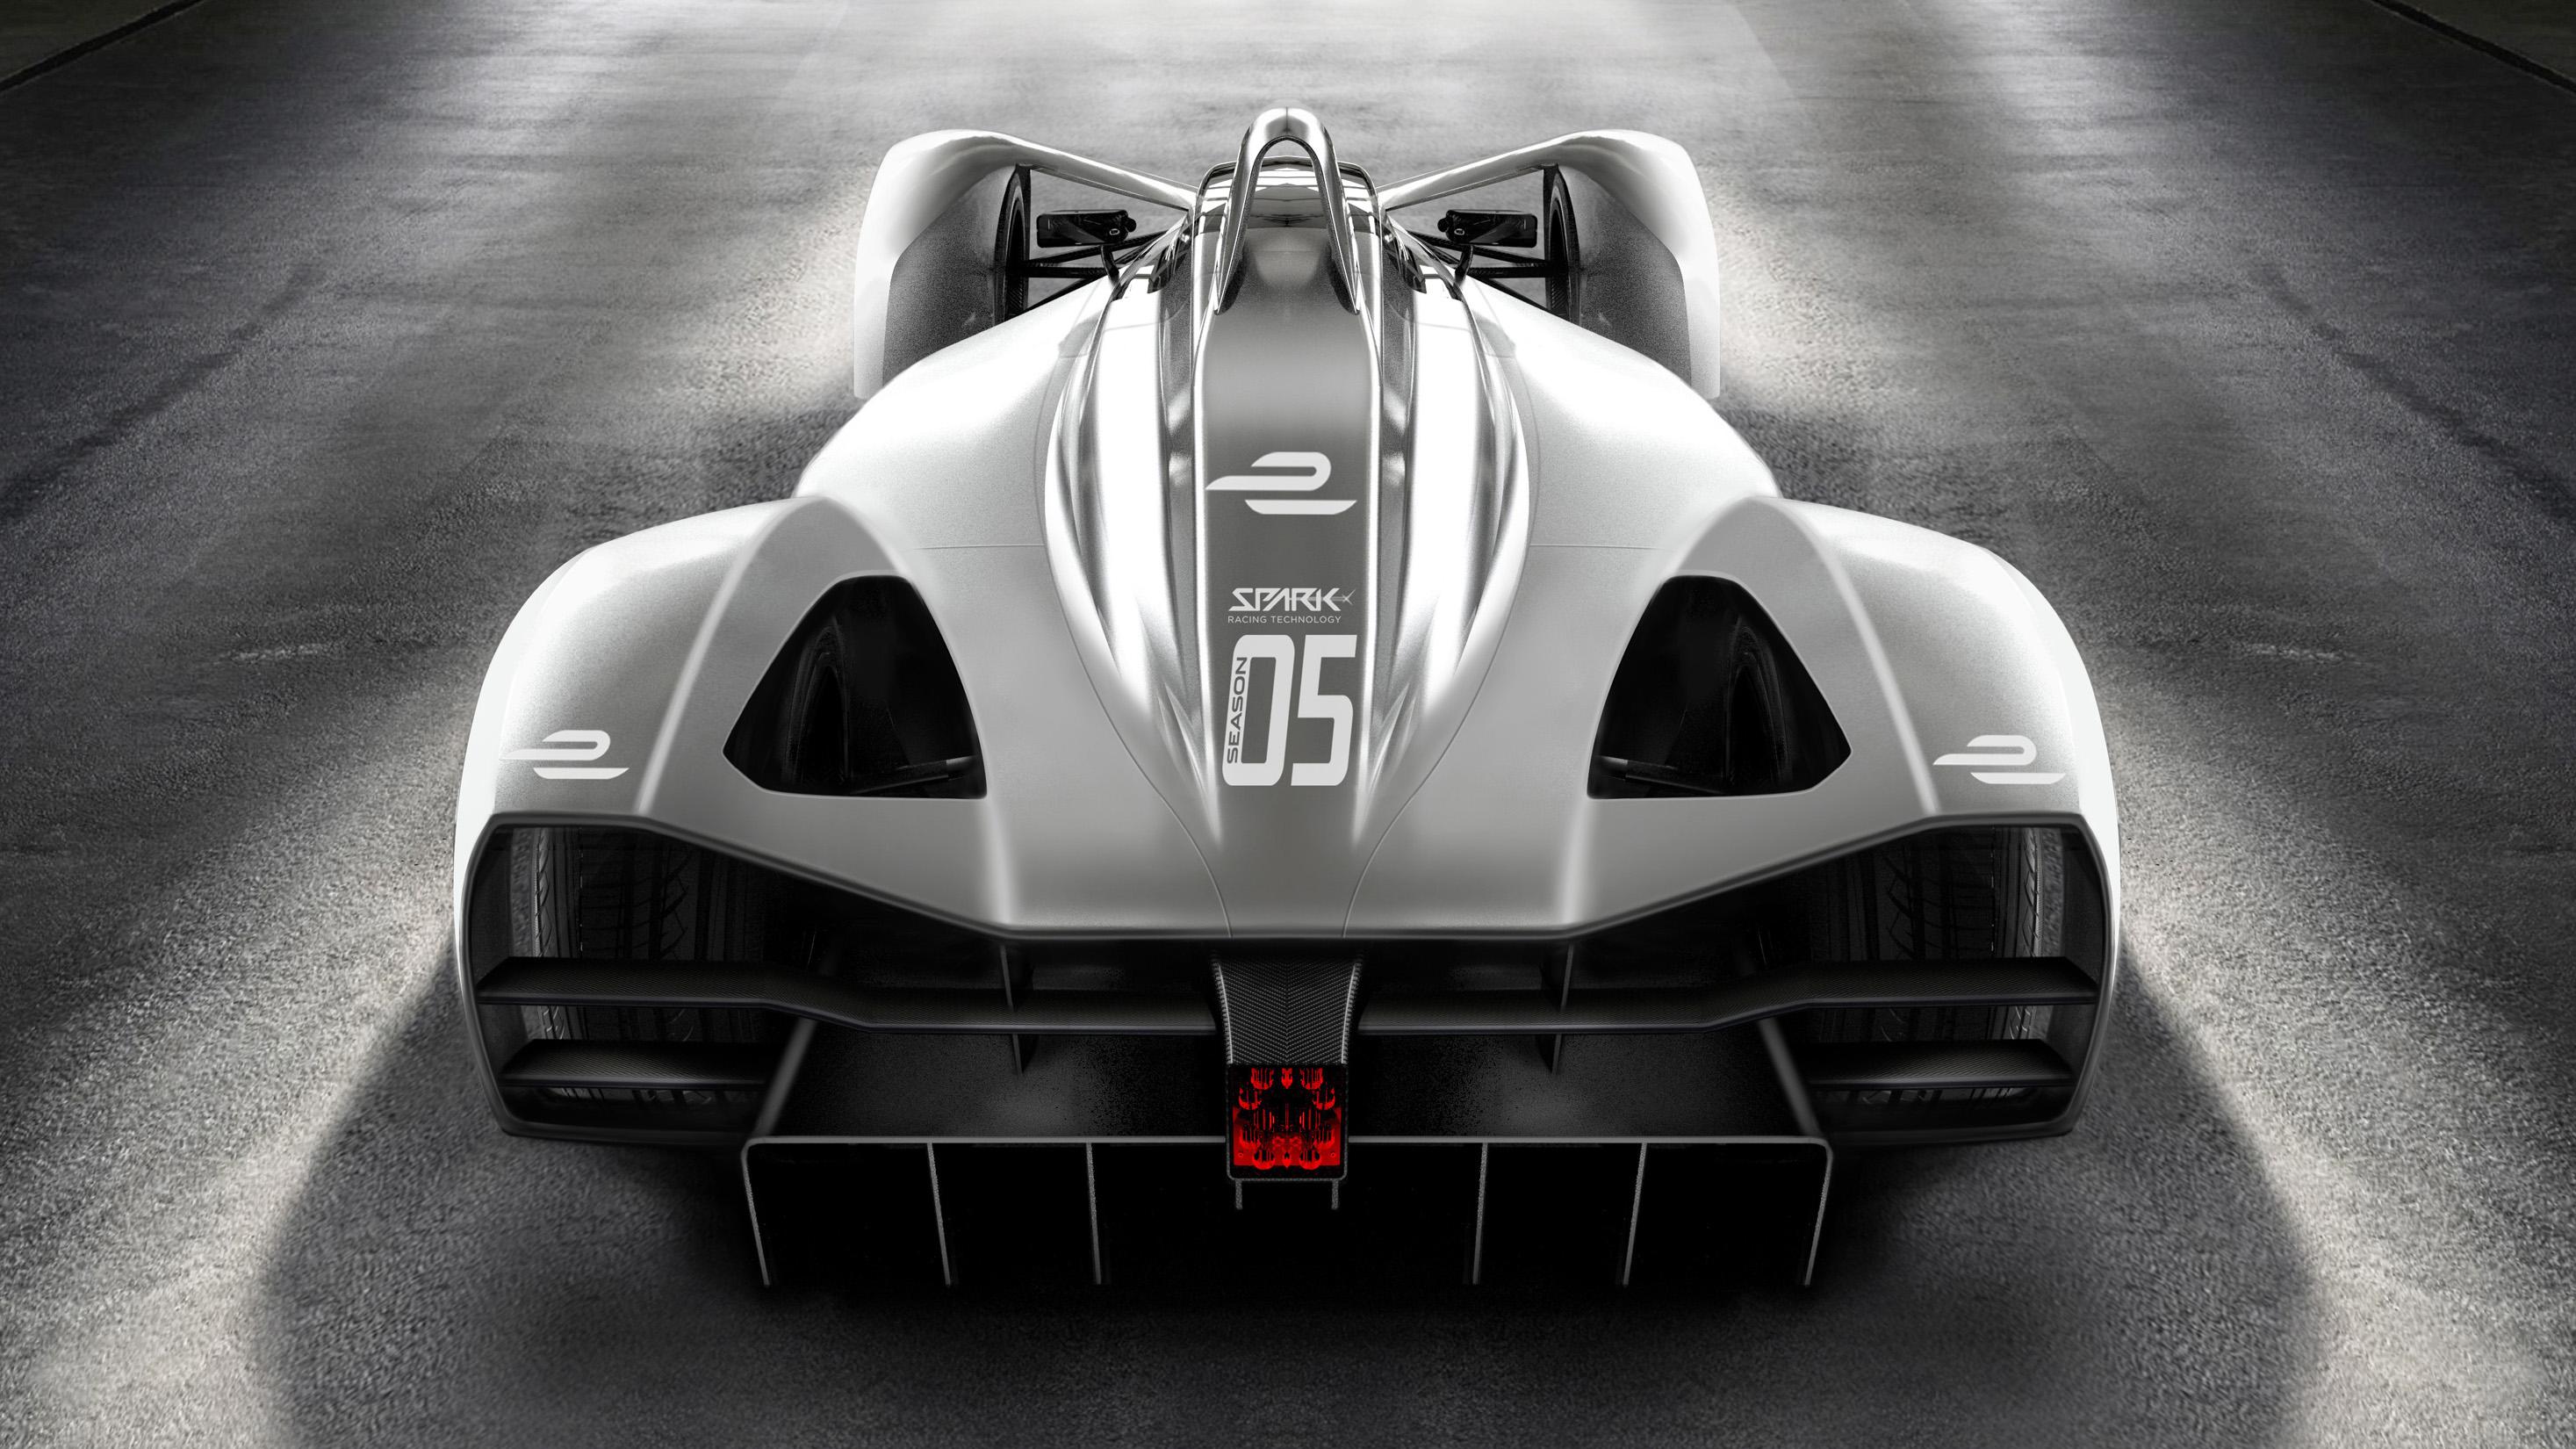 05_Formula_E_Spark_Season_5_Rear.jpg